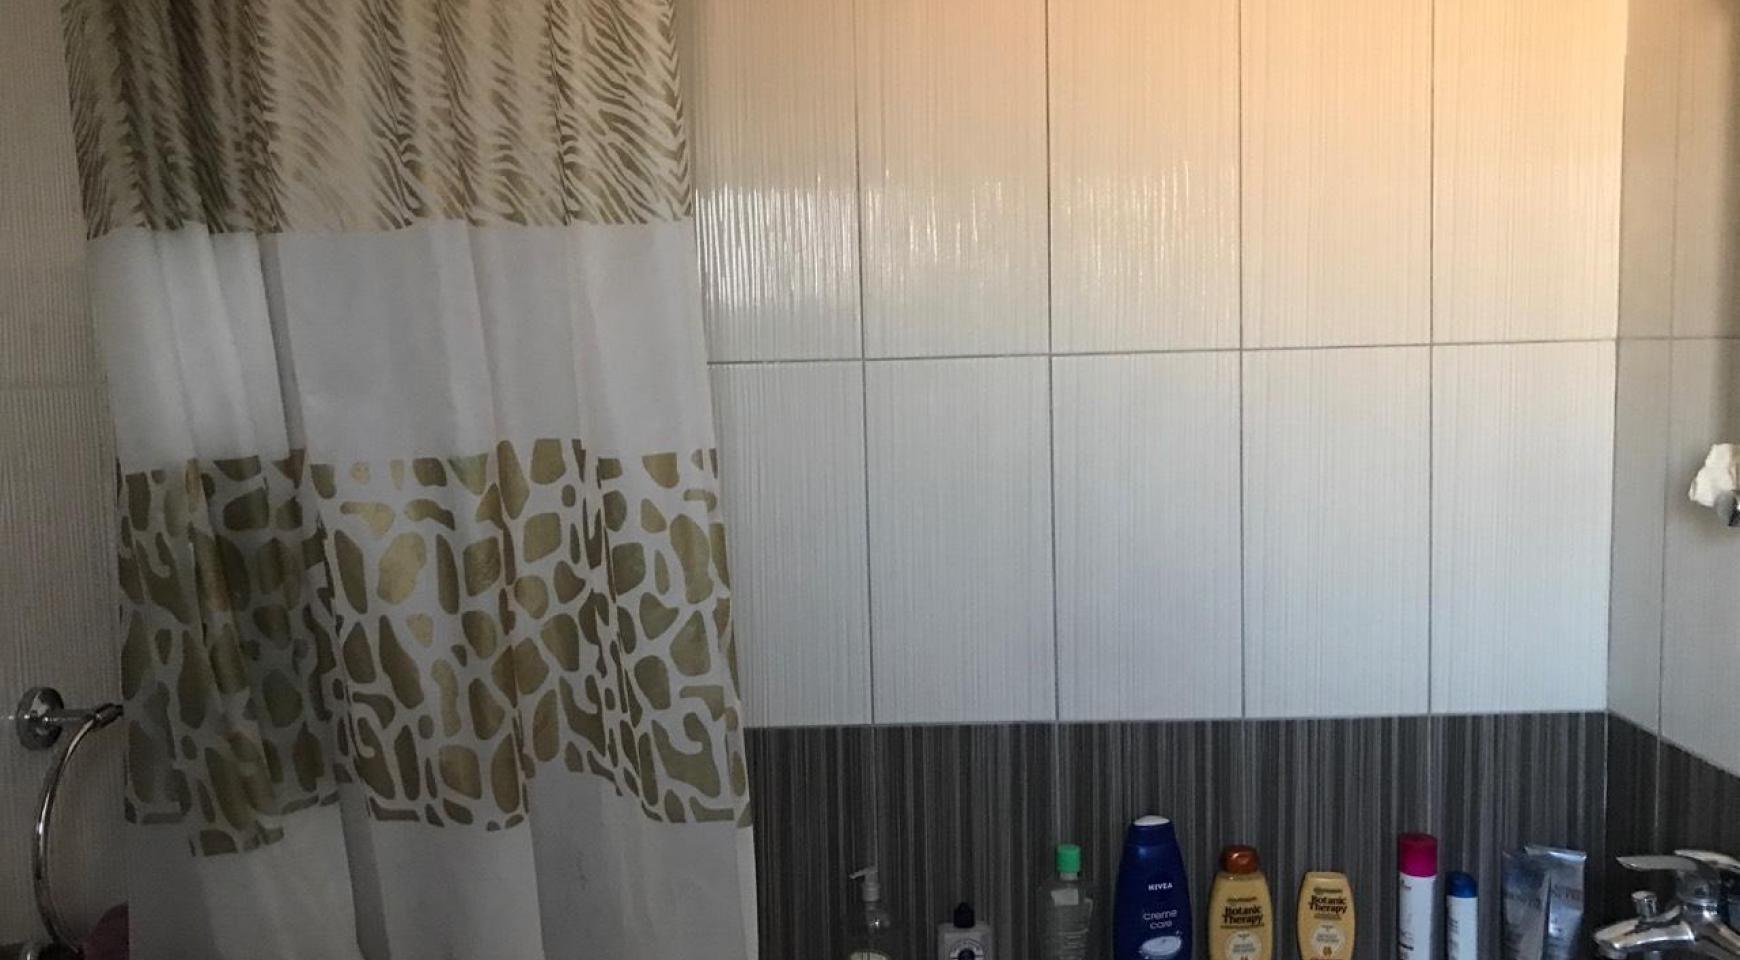 3 Bedroom Apartment in Molos Area near Limassol Marina - 18